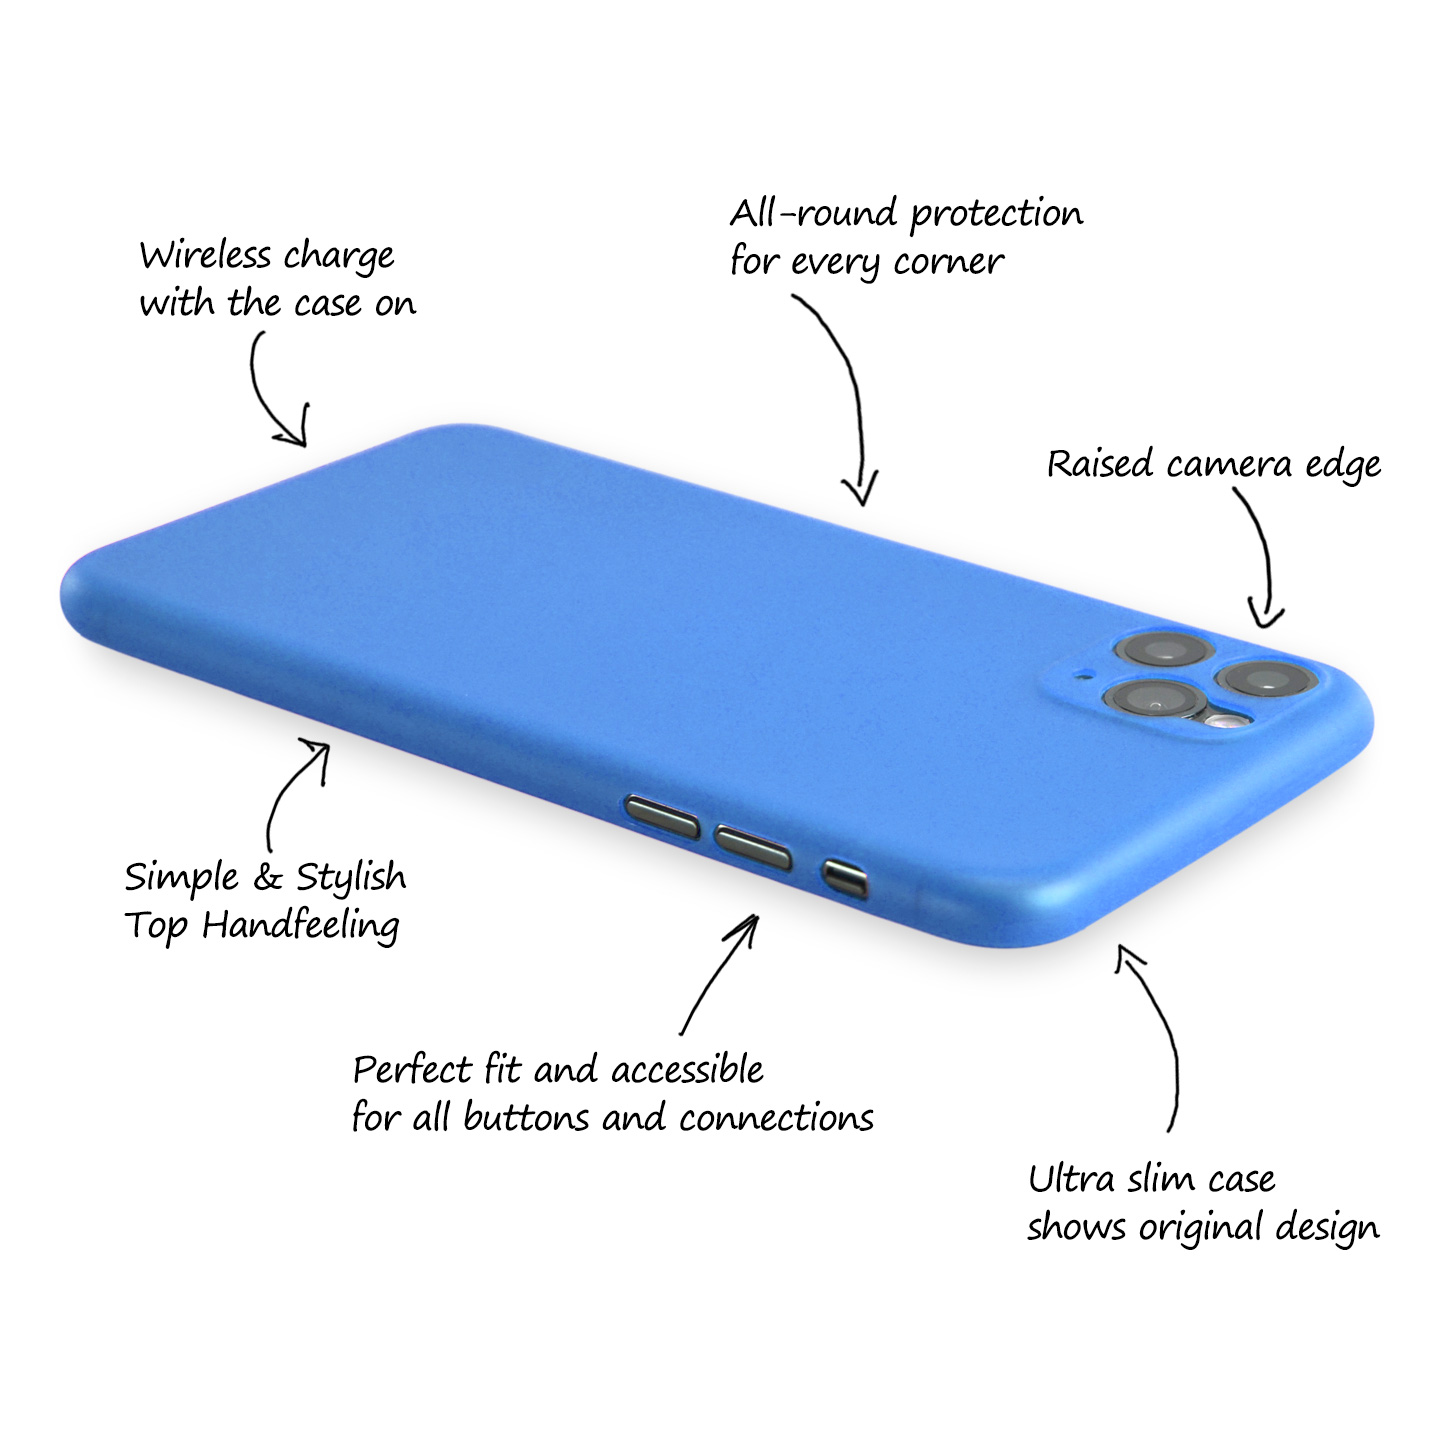 Ultra-Slim-Case-iPhone-11-Pro-5-8-034-Matt-Clear-Schutz-Huelle-Skin-Cover-Etui-Folie Indexbild 26